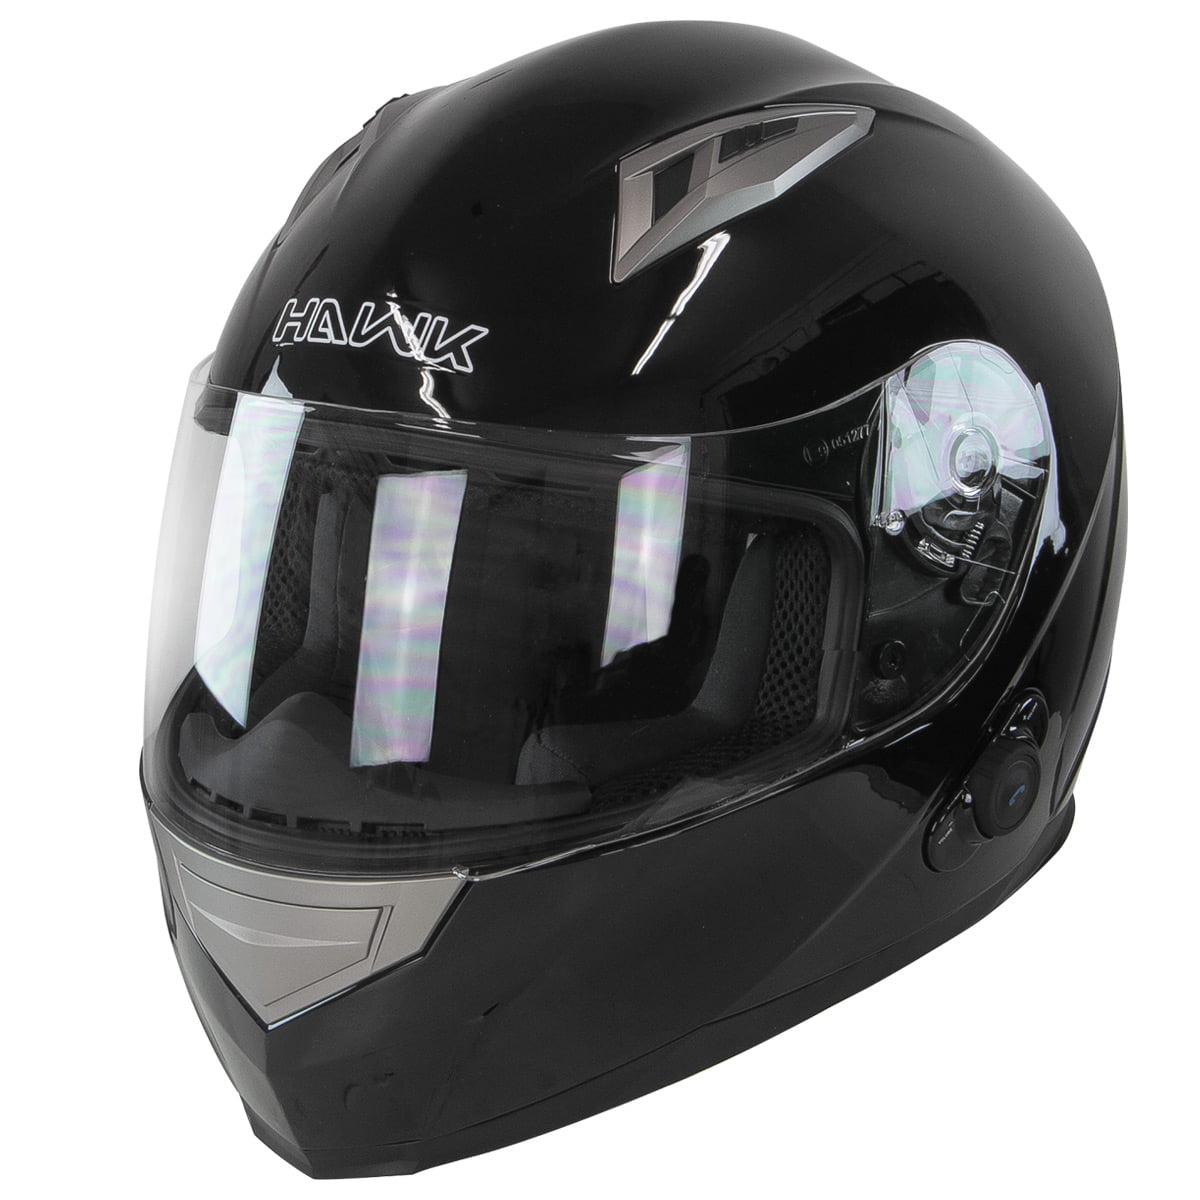 Hawk H-510 Glossy Black Bluetooth Full Face Helmet